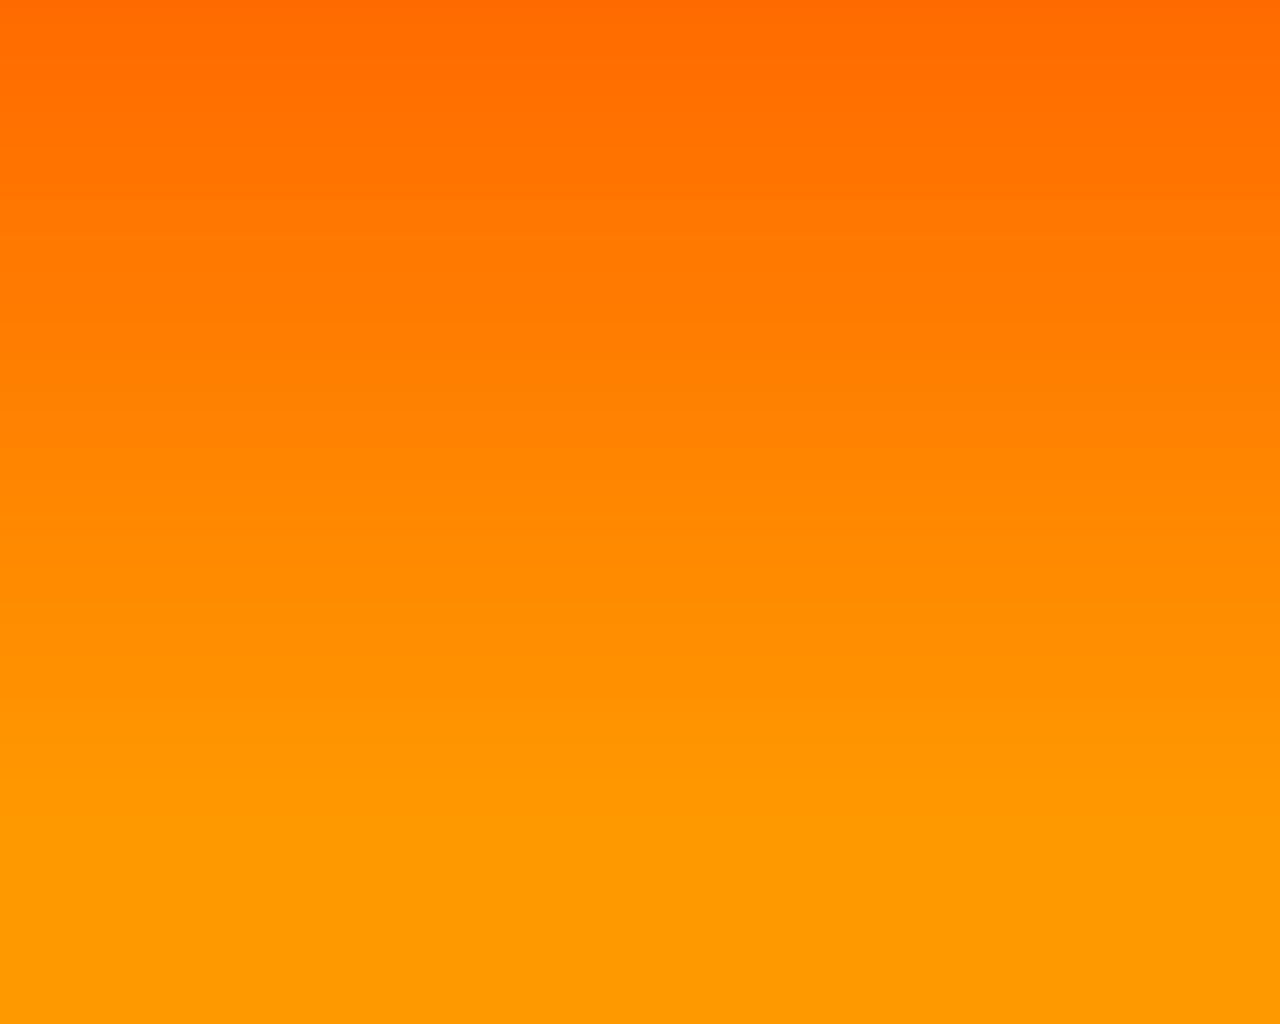 Orange Wallpaper by soxrox22 1280x1024